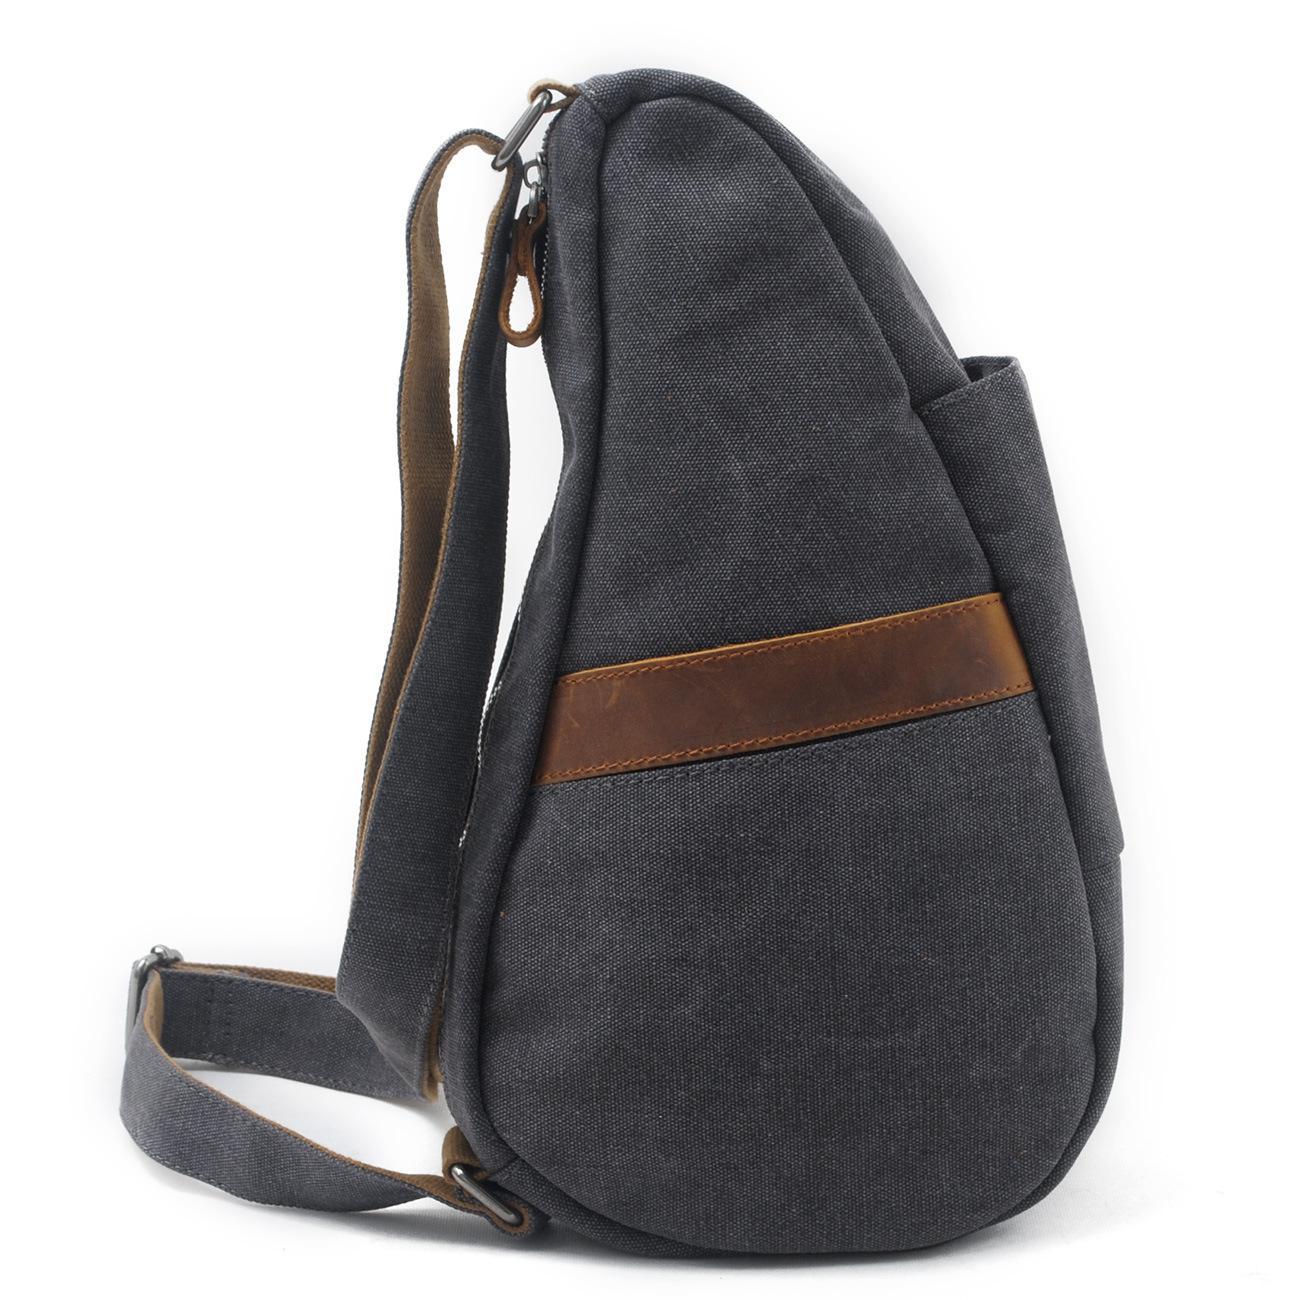 Man Canvas Chest Bag Fashion Messenger Casual Travel Chest Bag Back Pack Men's Single Shoulder Bags Small Travel Chest Pack все цены